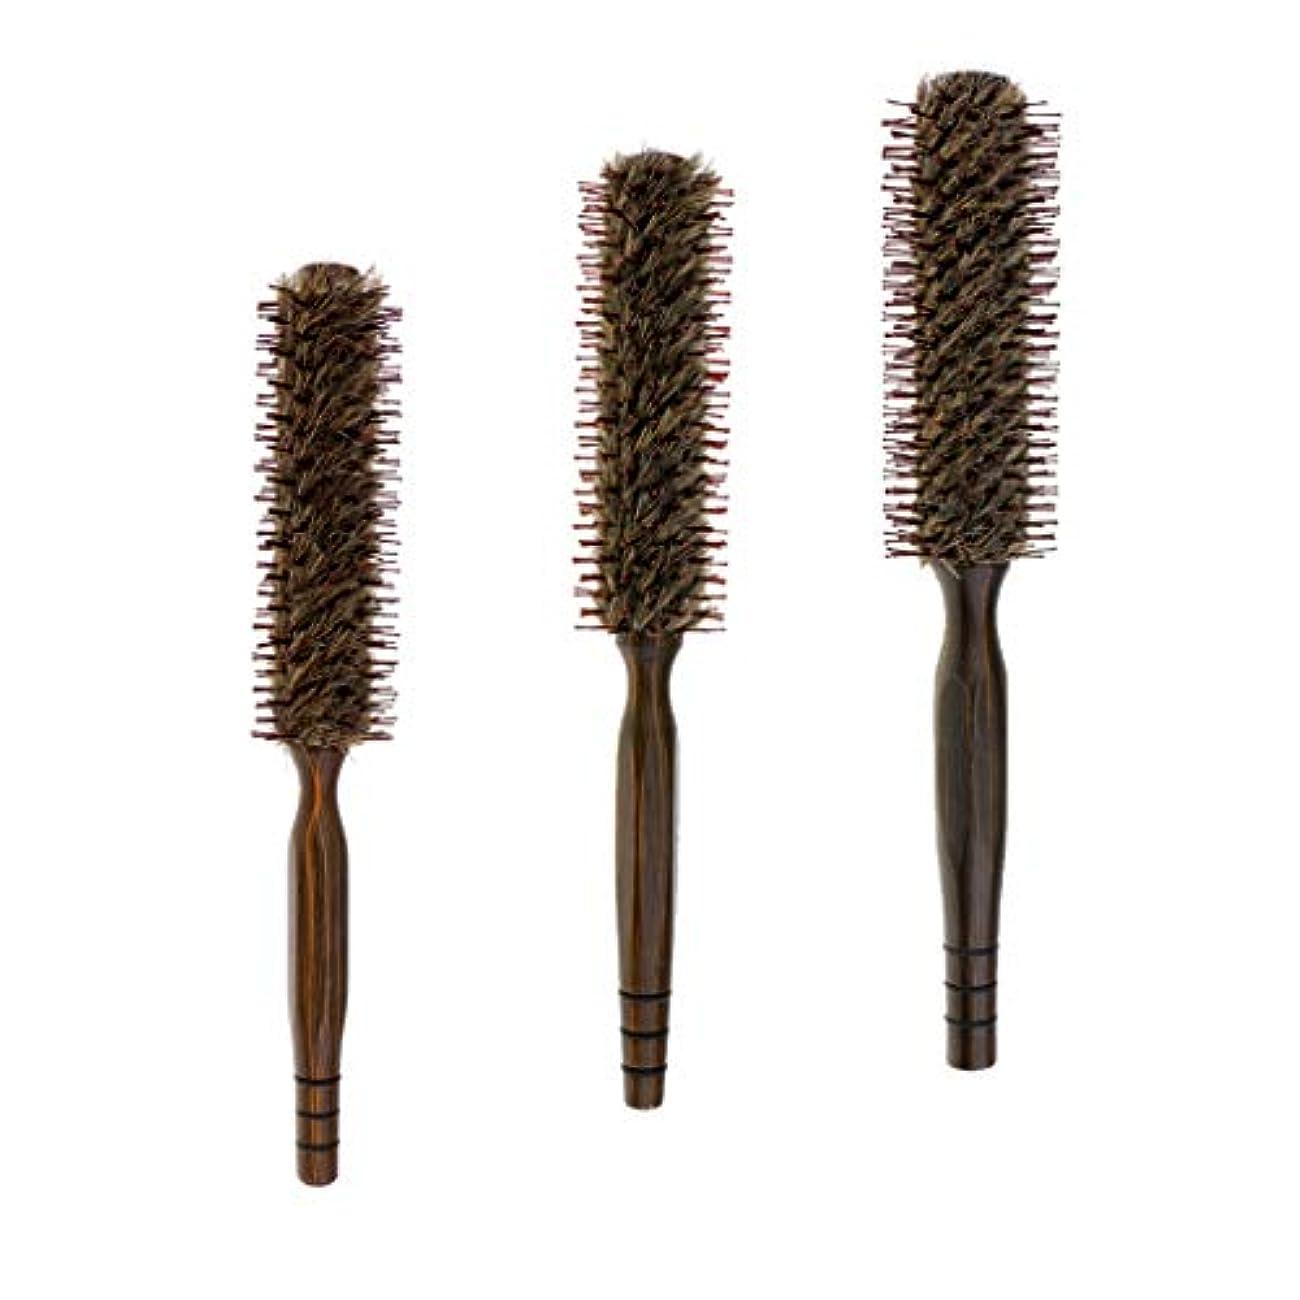 Toygogo 3パック小さい丸い木製理髪の毛の巻き毛の櫛のブラシ18/20 / 22mm